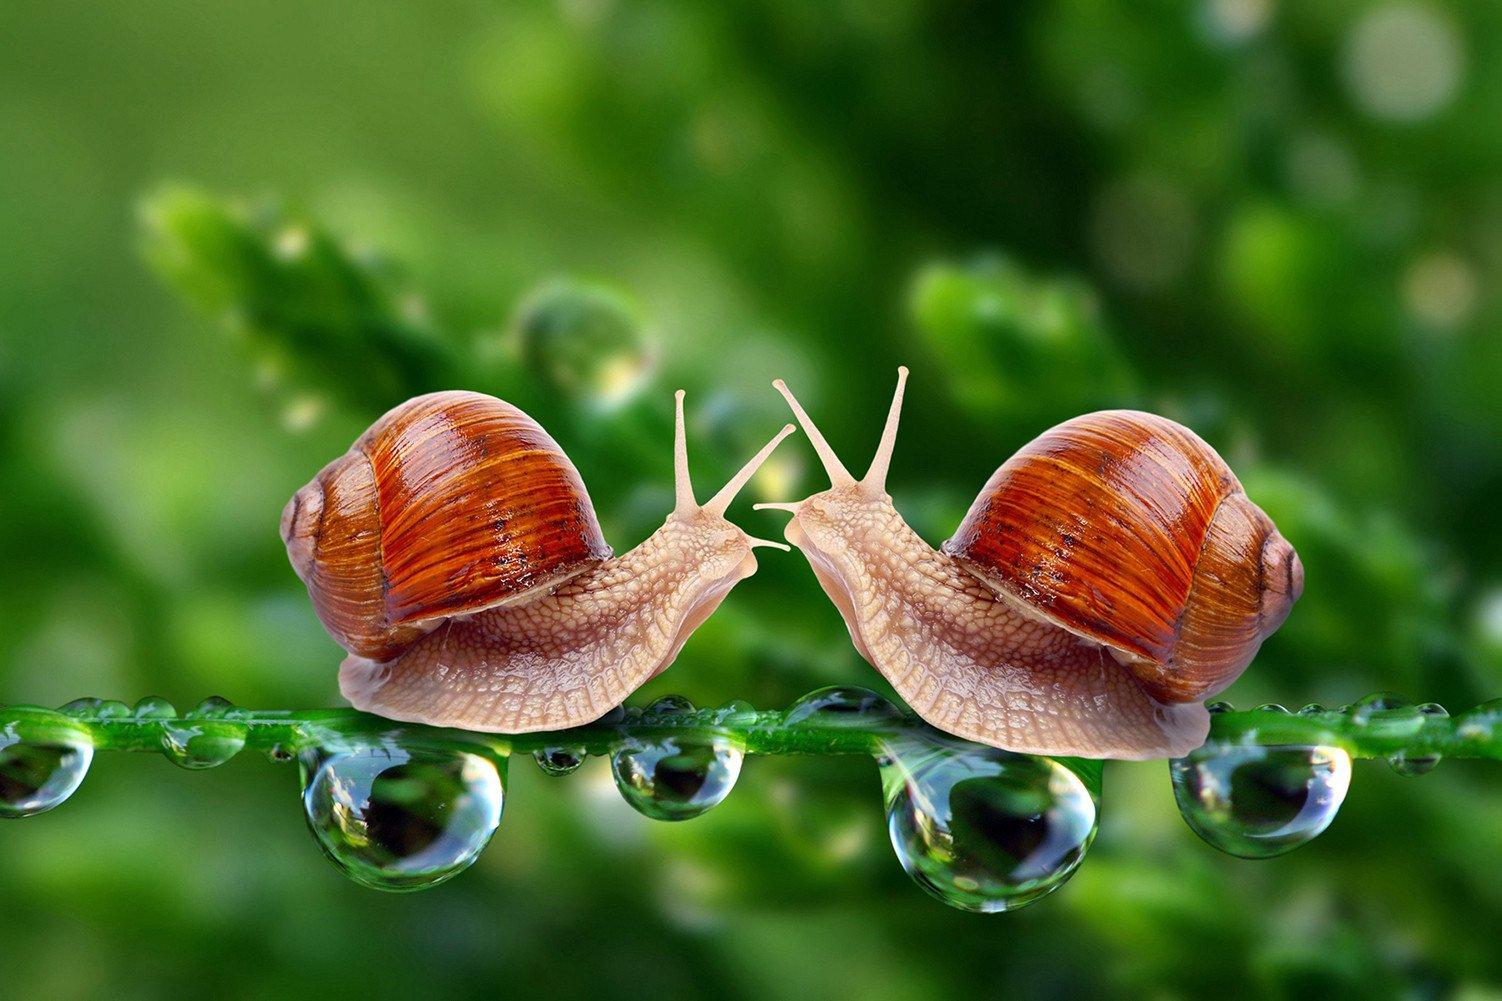 CHOIS Custom Films CF3312 Animal Snails Drops Glass Window Decor DIY Stickers 4' W by 3' H